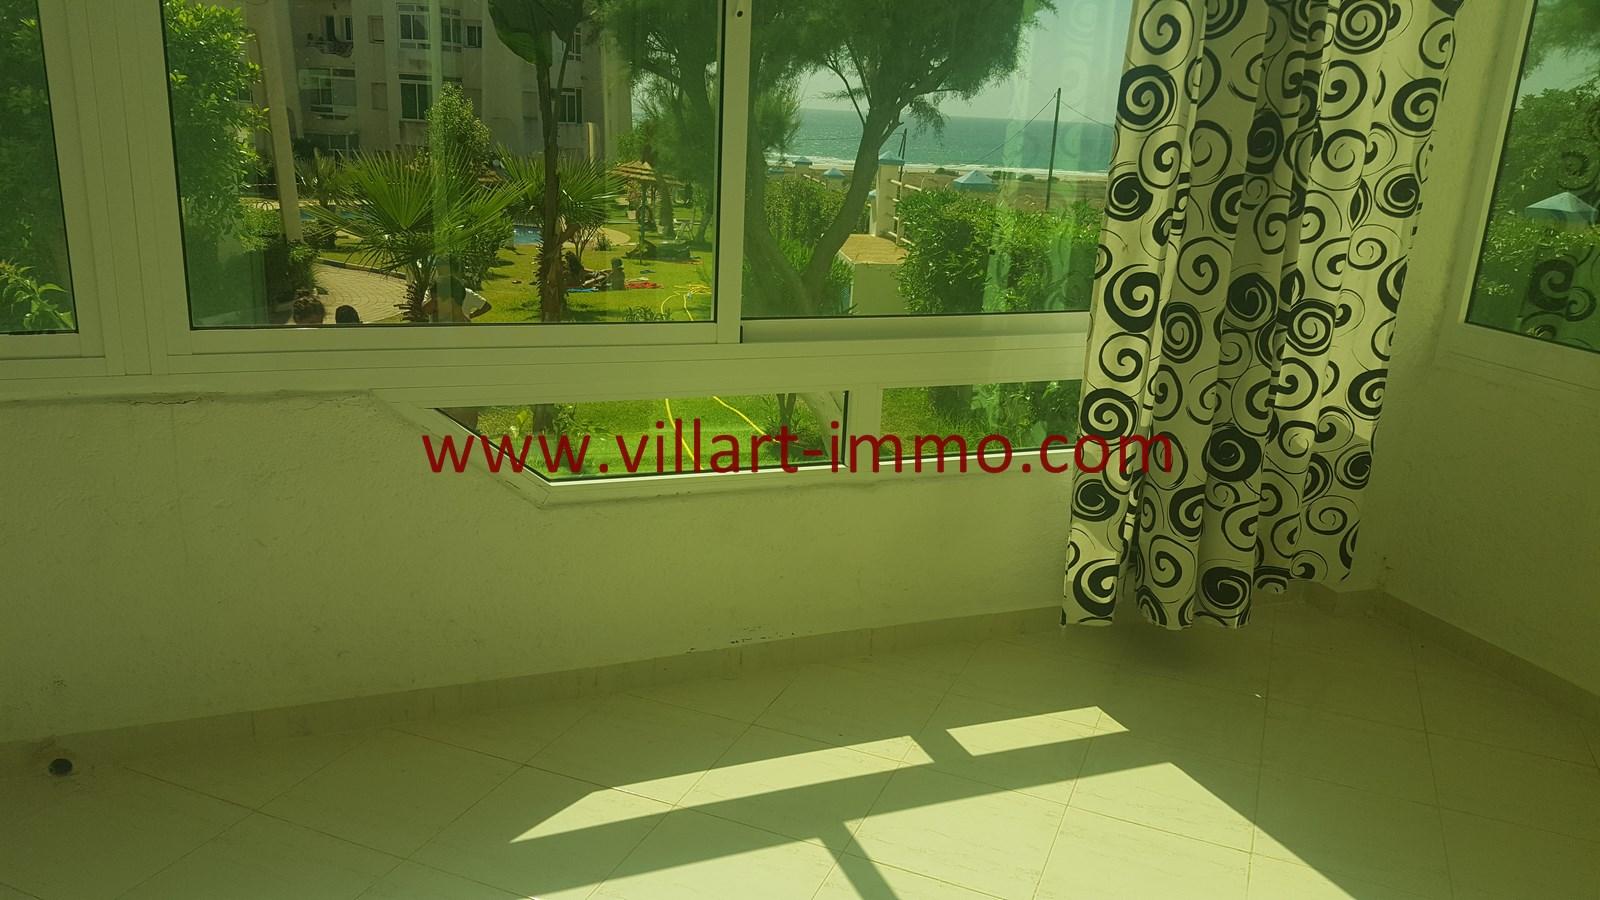 6-Vente-Appartement-Assilah-Terrasse 1-VA508-Villart Immo